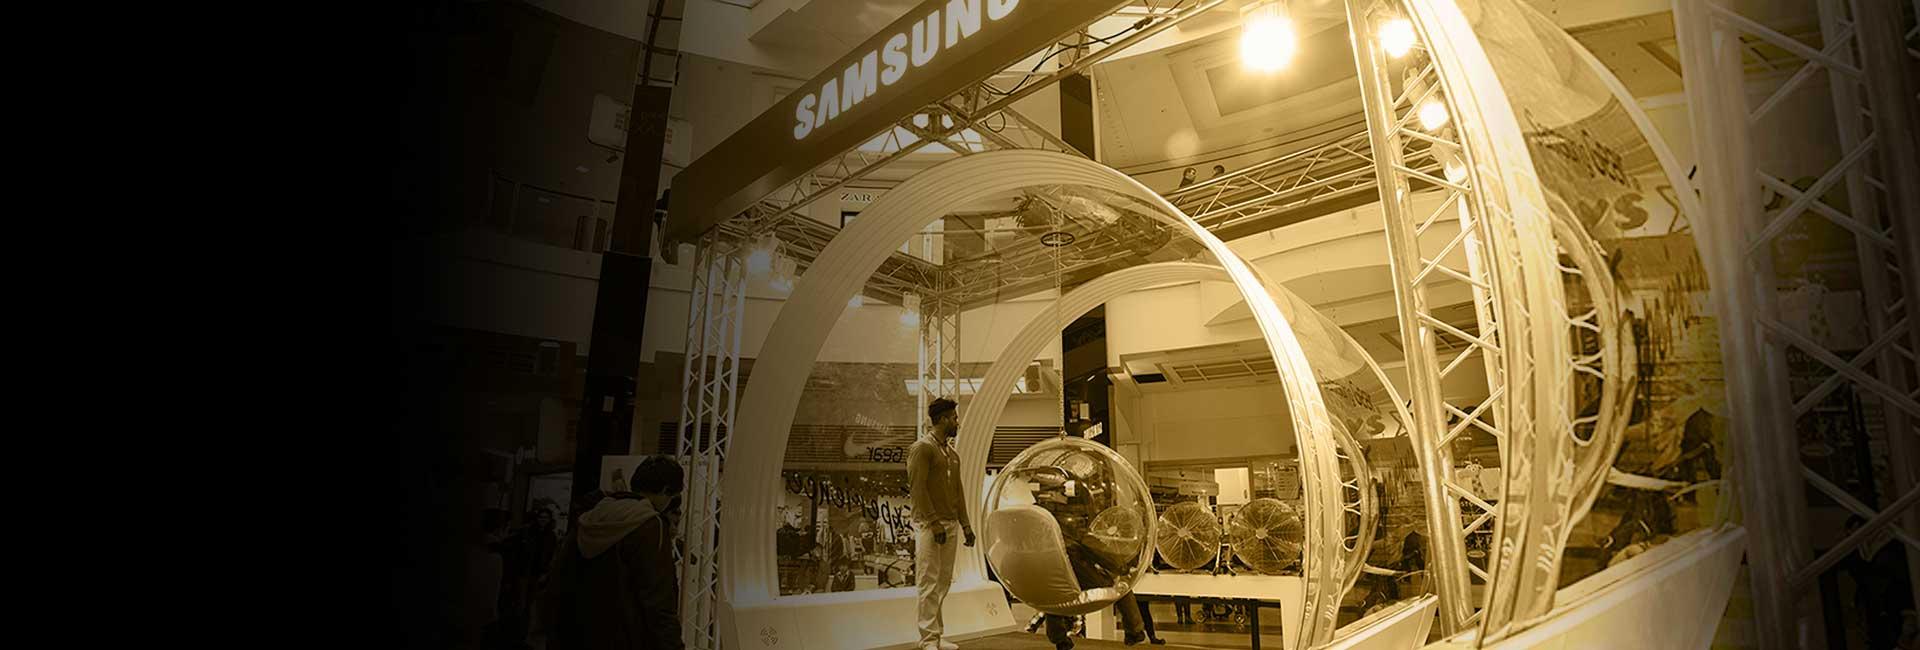 samsung-banber01